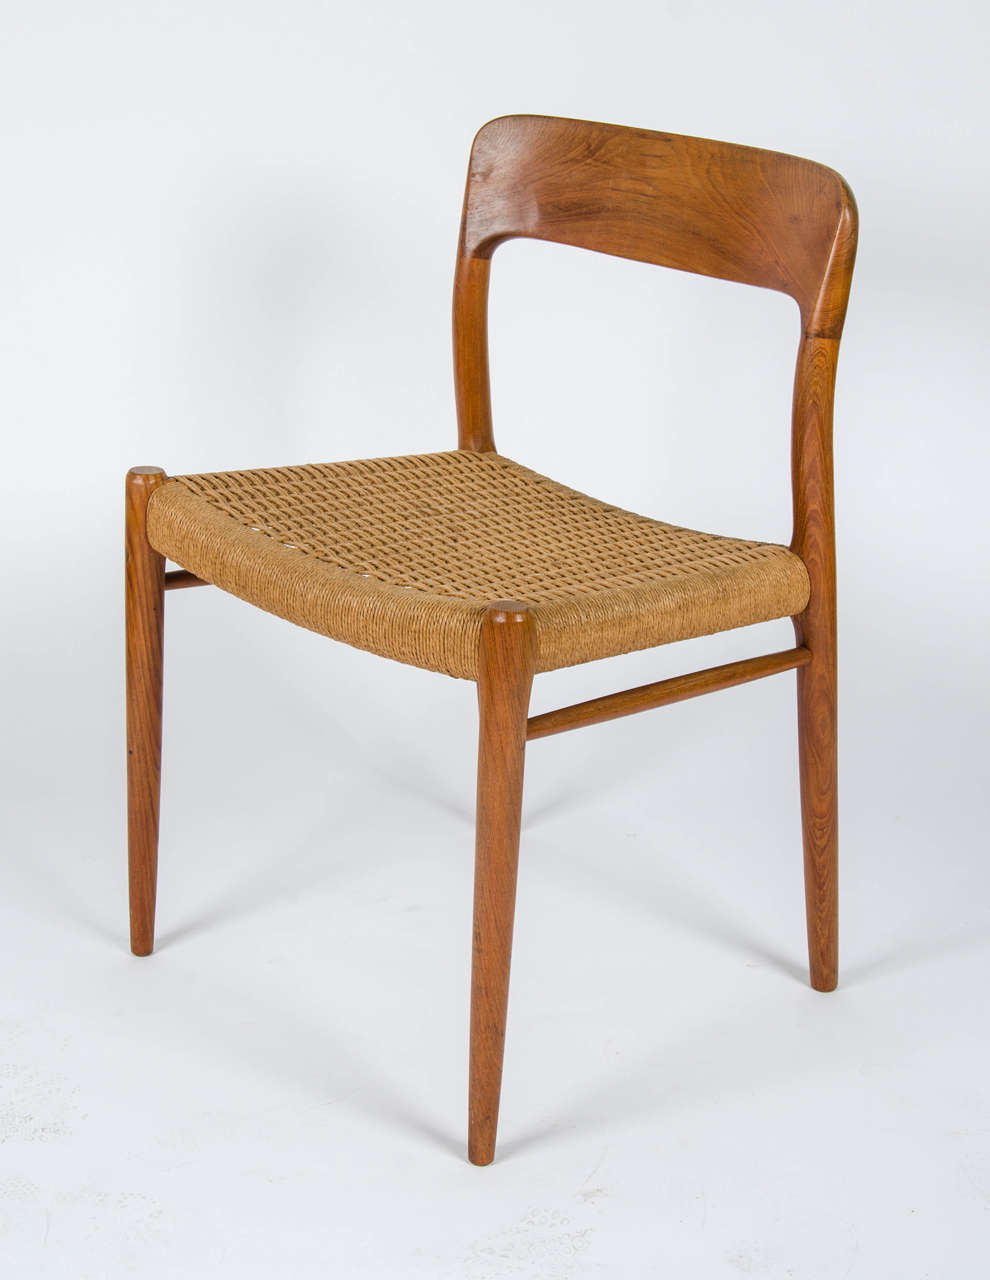 Delightful Niels O. Møller For JL Möller, Model 75 Chairs 3